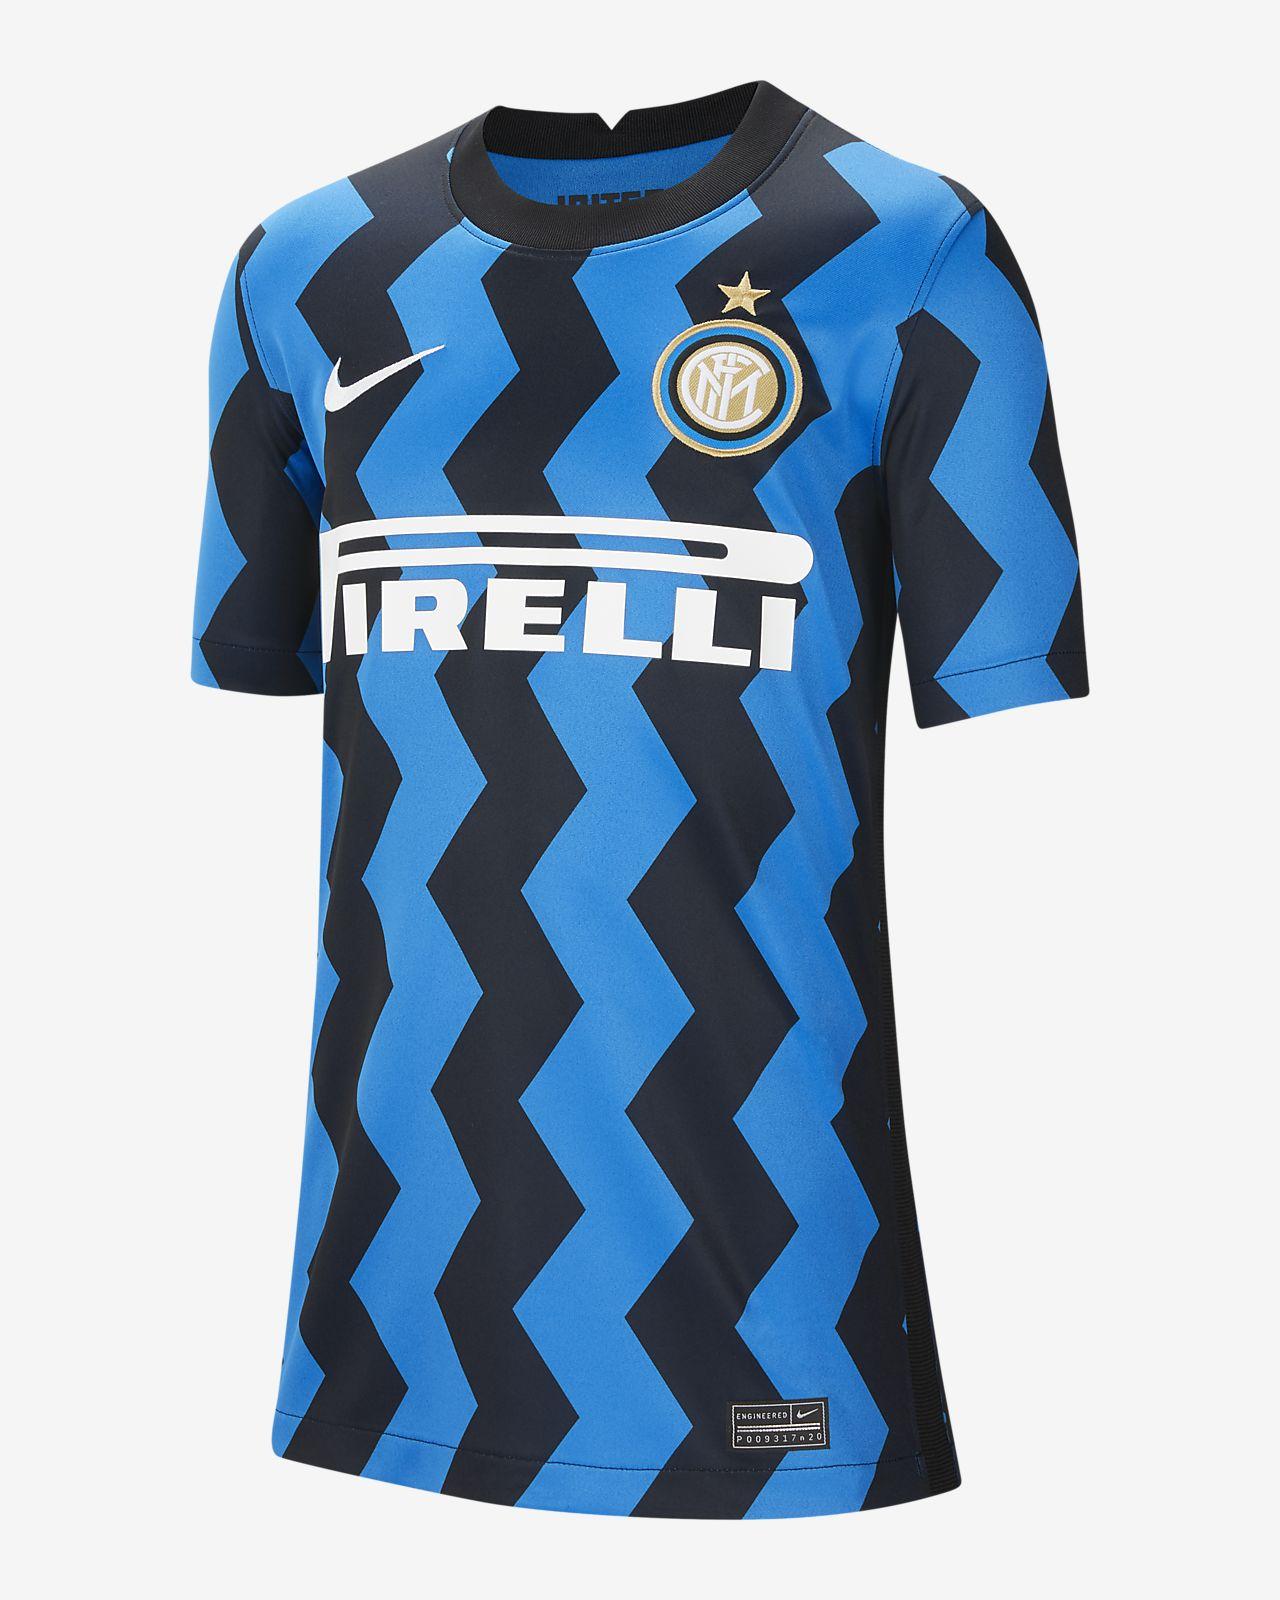 Camiseta de fútbol para niños talla grande Inter Milan 2020/21 Stadium Home